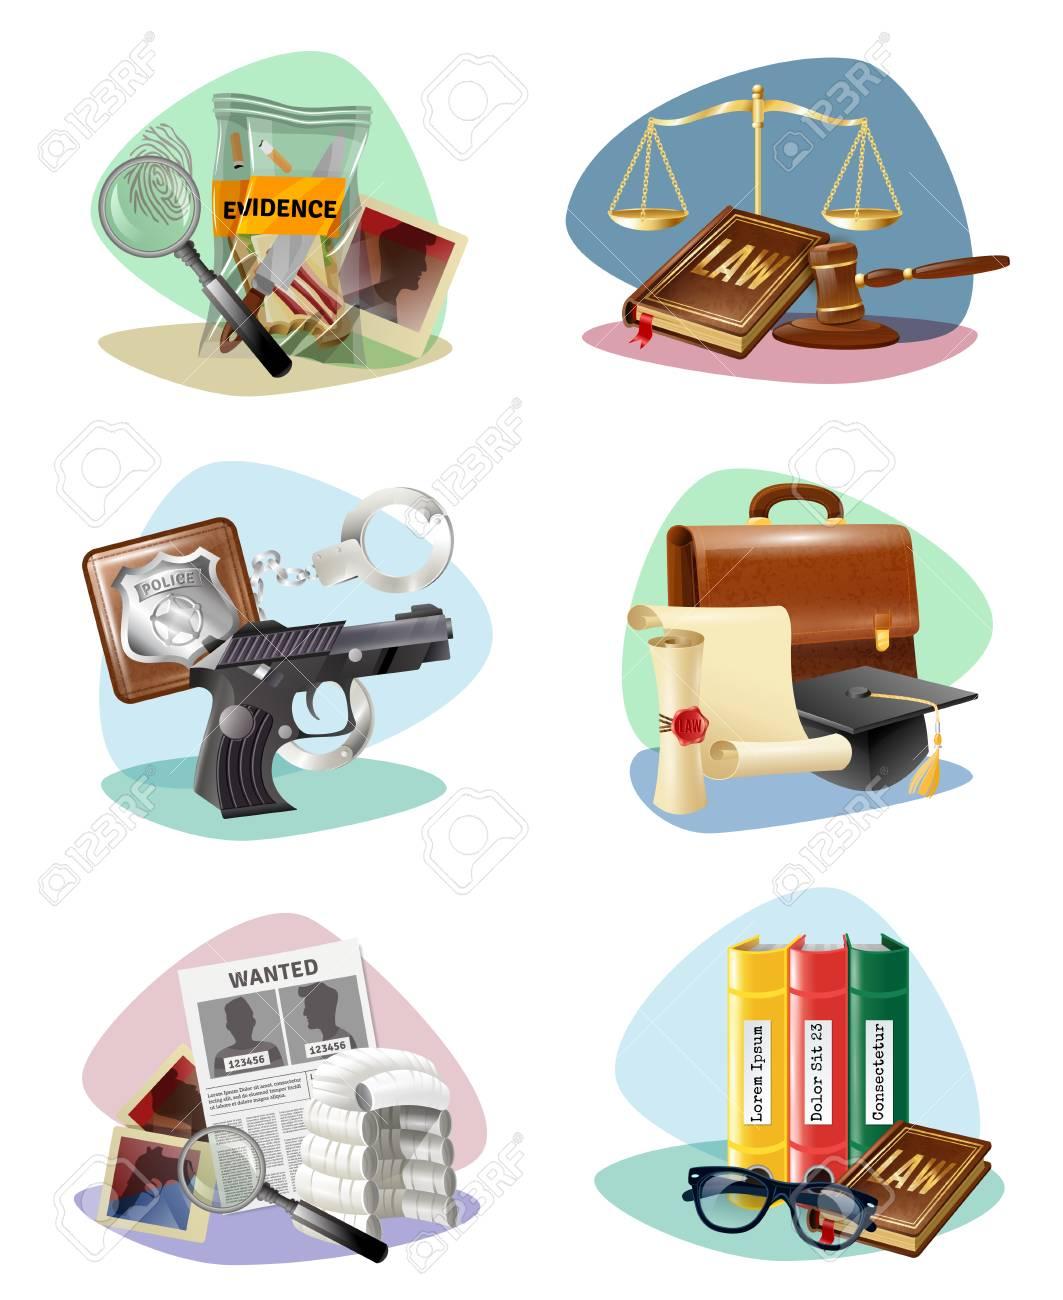 Civil Law Legal System Symbols And Criminal Justice Investigation